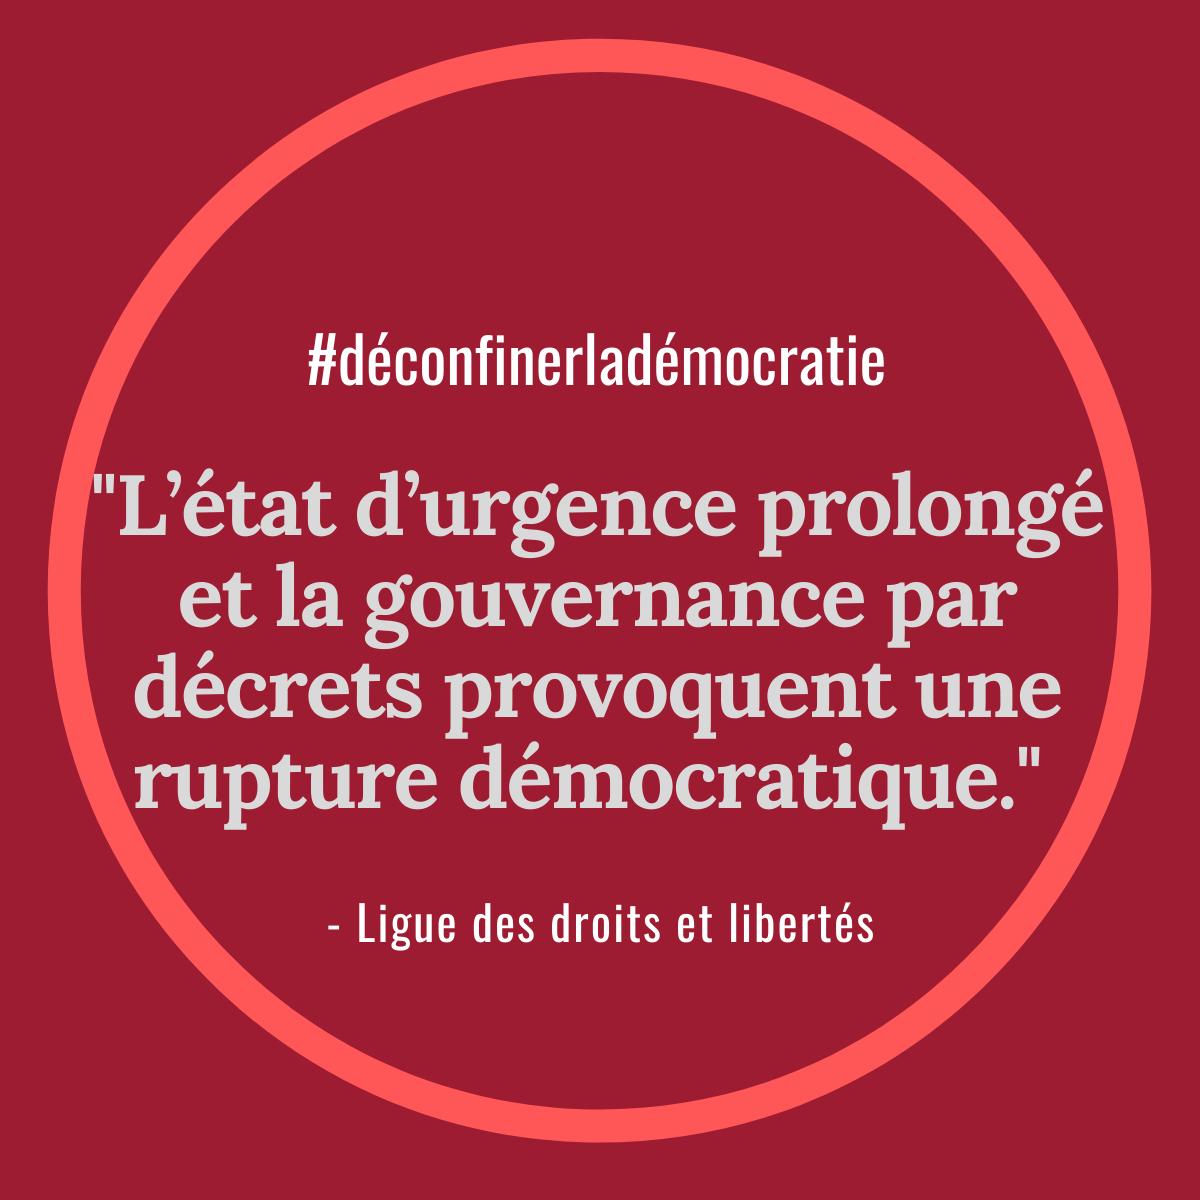 rupture_democratique_20210713